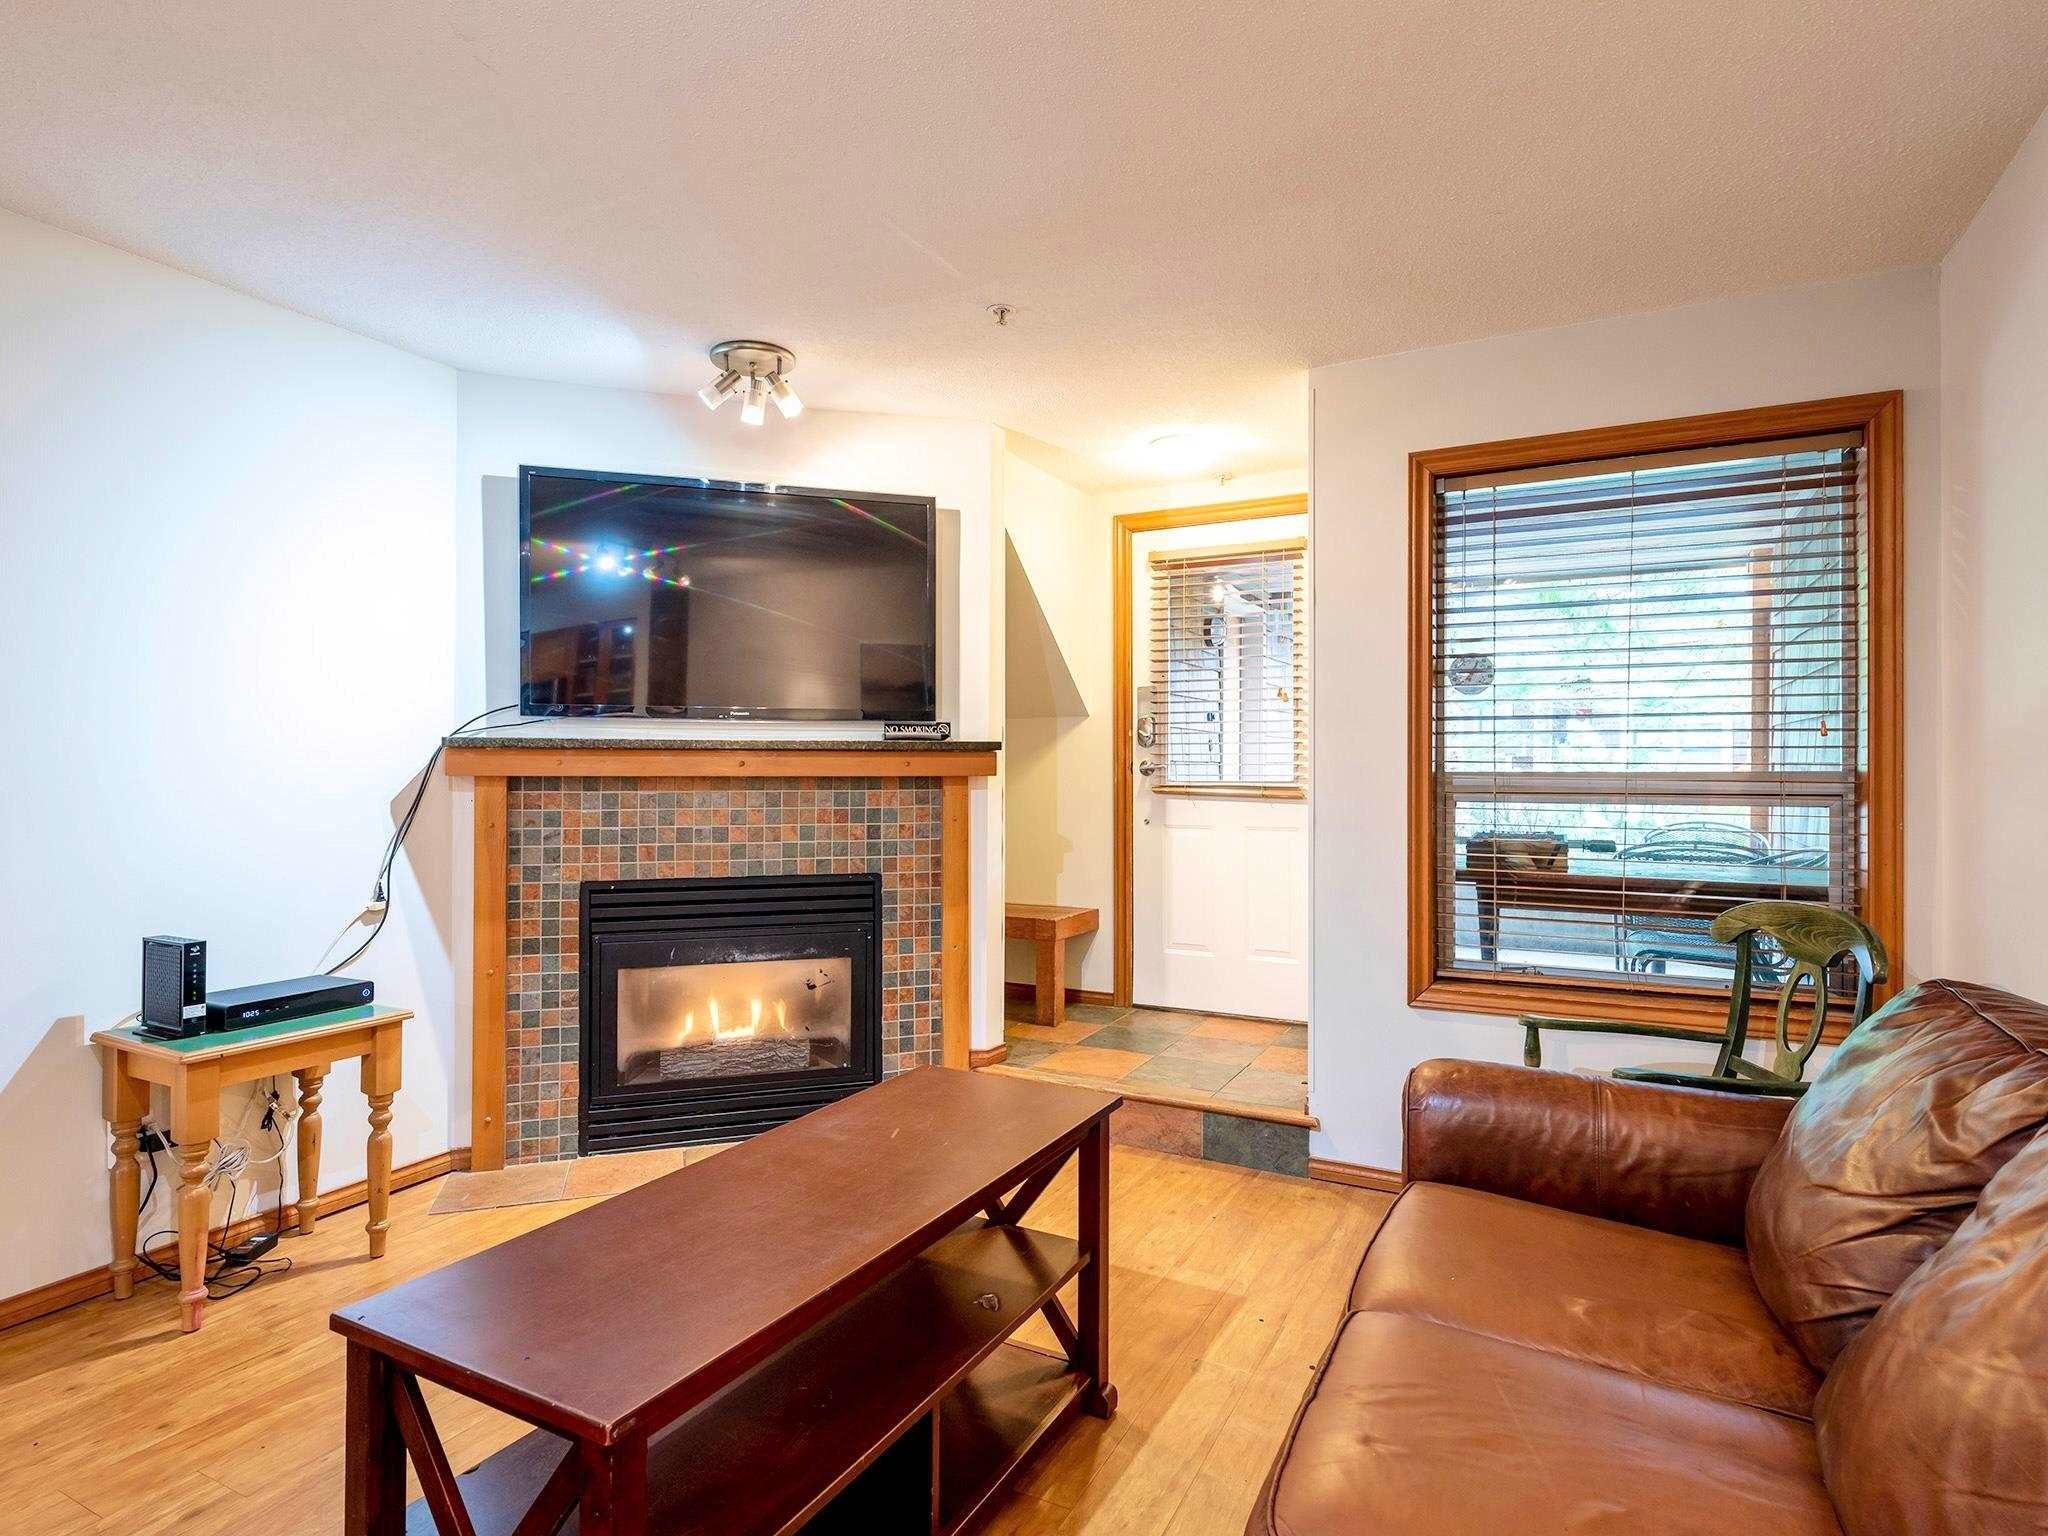 73 4388 NORTHLANDS BOULEVARD - Whistler Village Townhouse for sale, 2 Bedrooms (R2580863) - #4